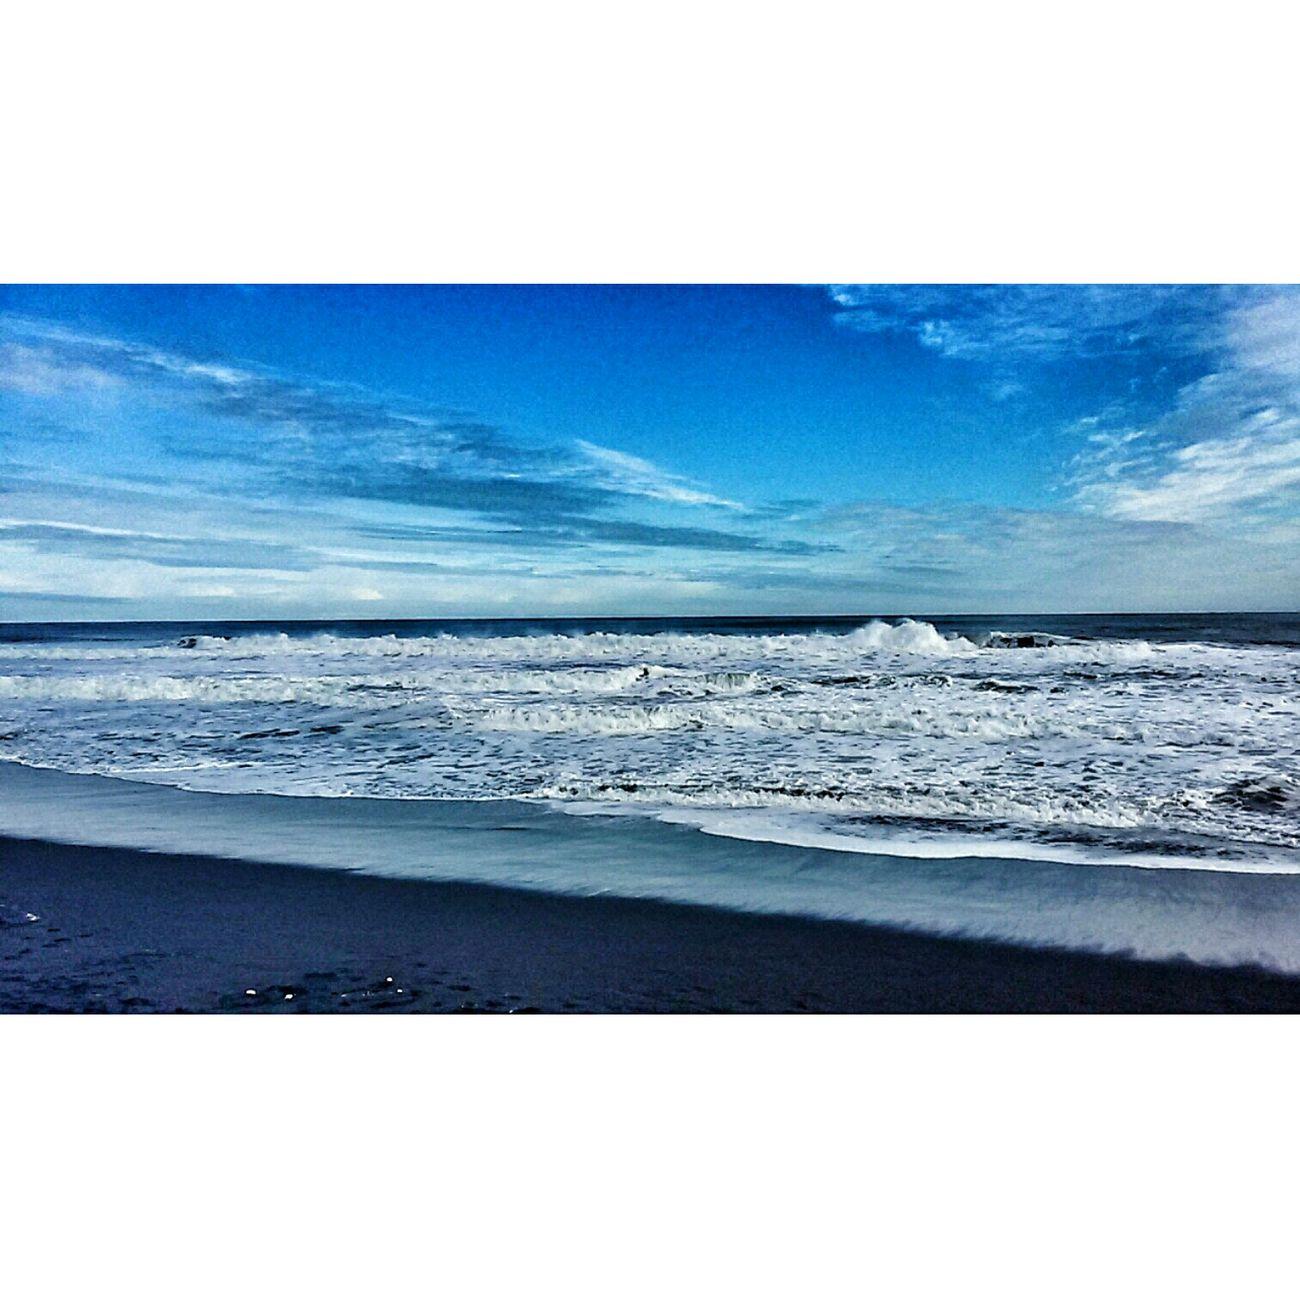 Sky Nature Day Water No People Beach Horizon Over Water Beauty In Nature небо⛅️ небомореоблака бухта небо, море, облака небо и облака White Happiness Камчатка;) камчатка камчатканавсегда Goodday Good Day Nature Sea Horizontal